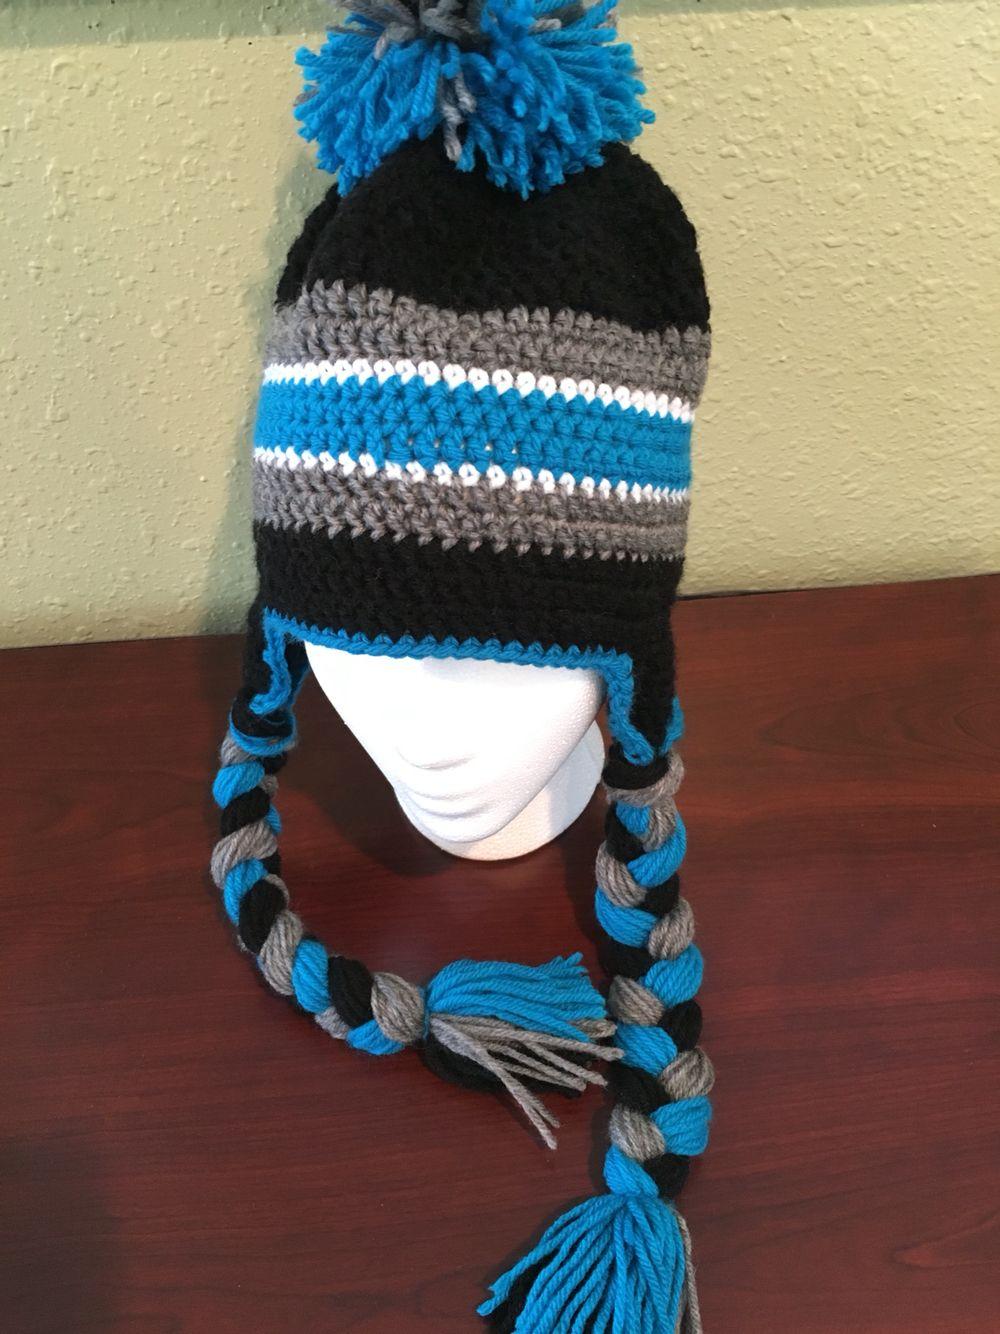 Crochet Carolina Panthers hat made by me  5d4b79540